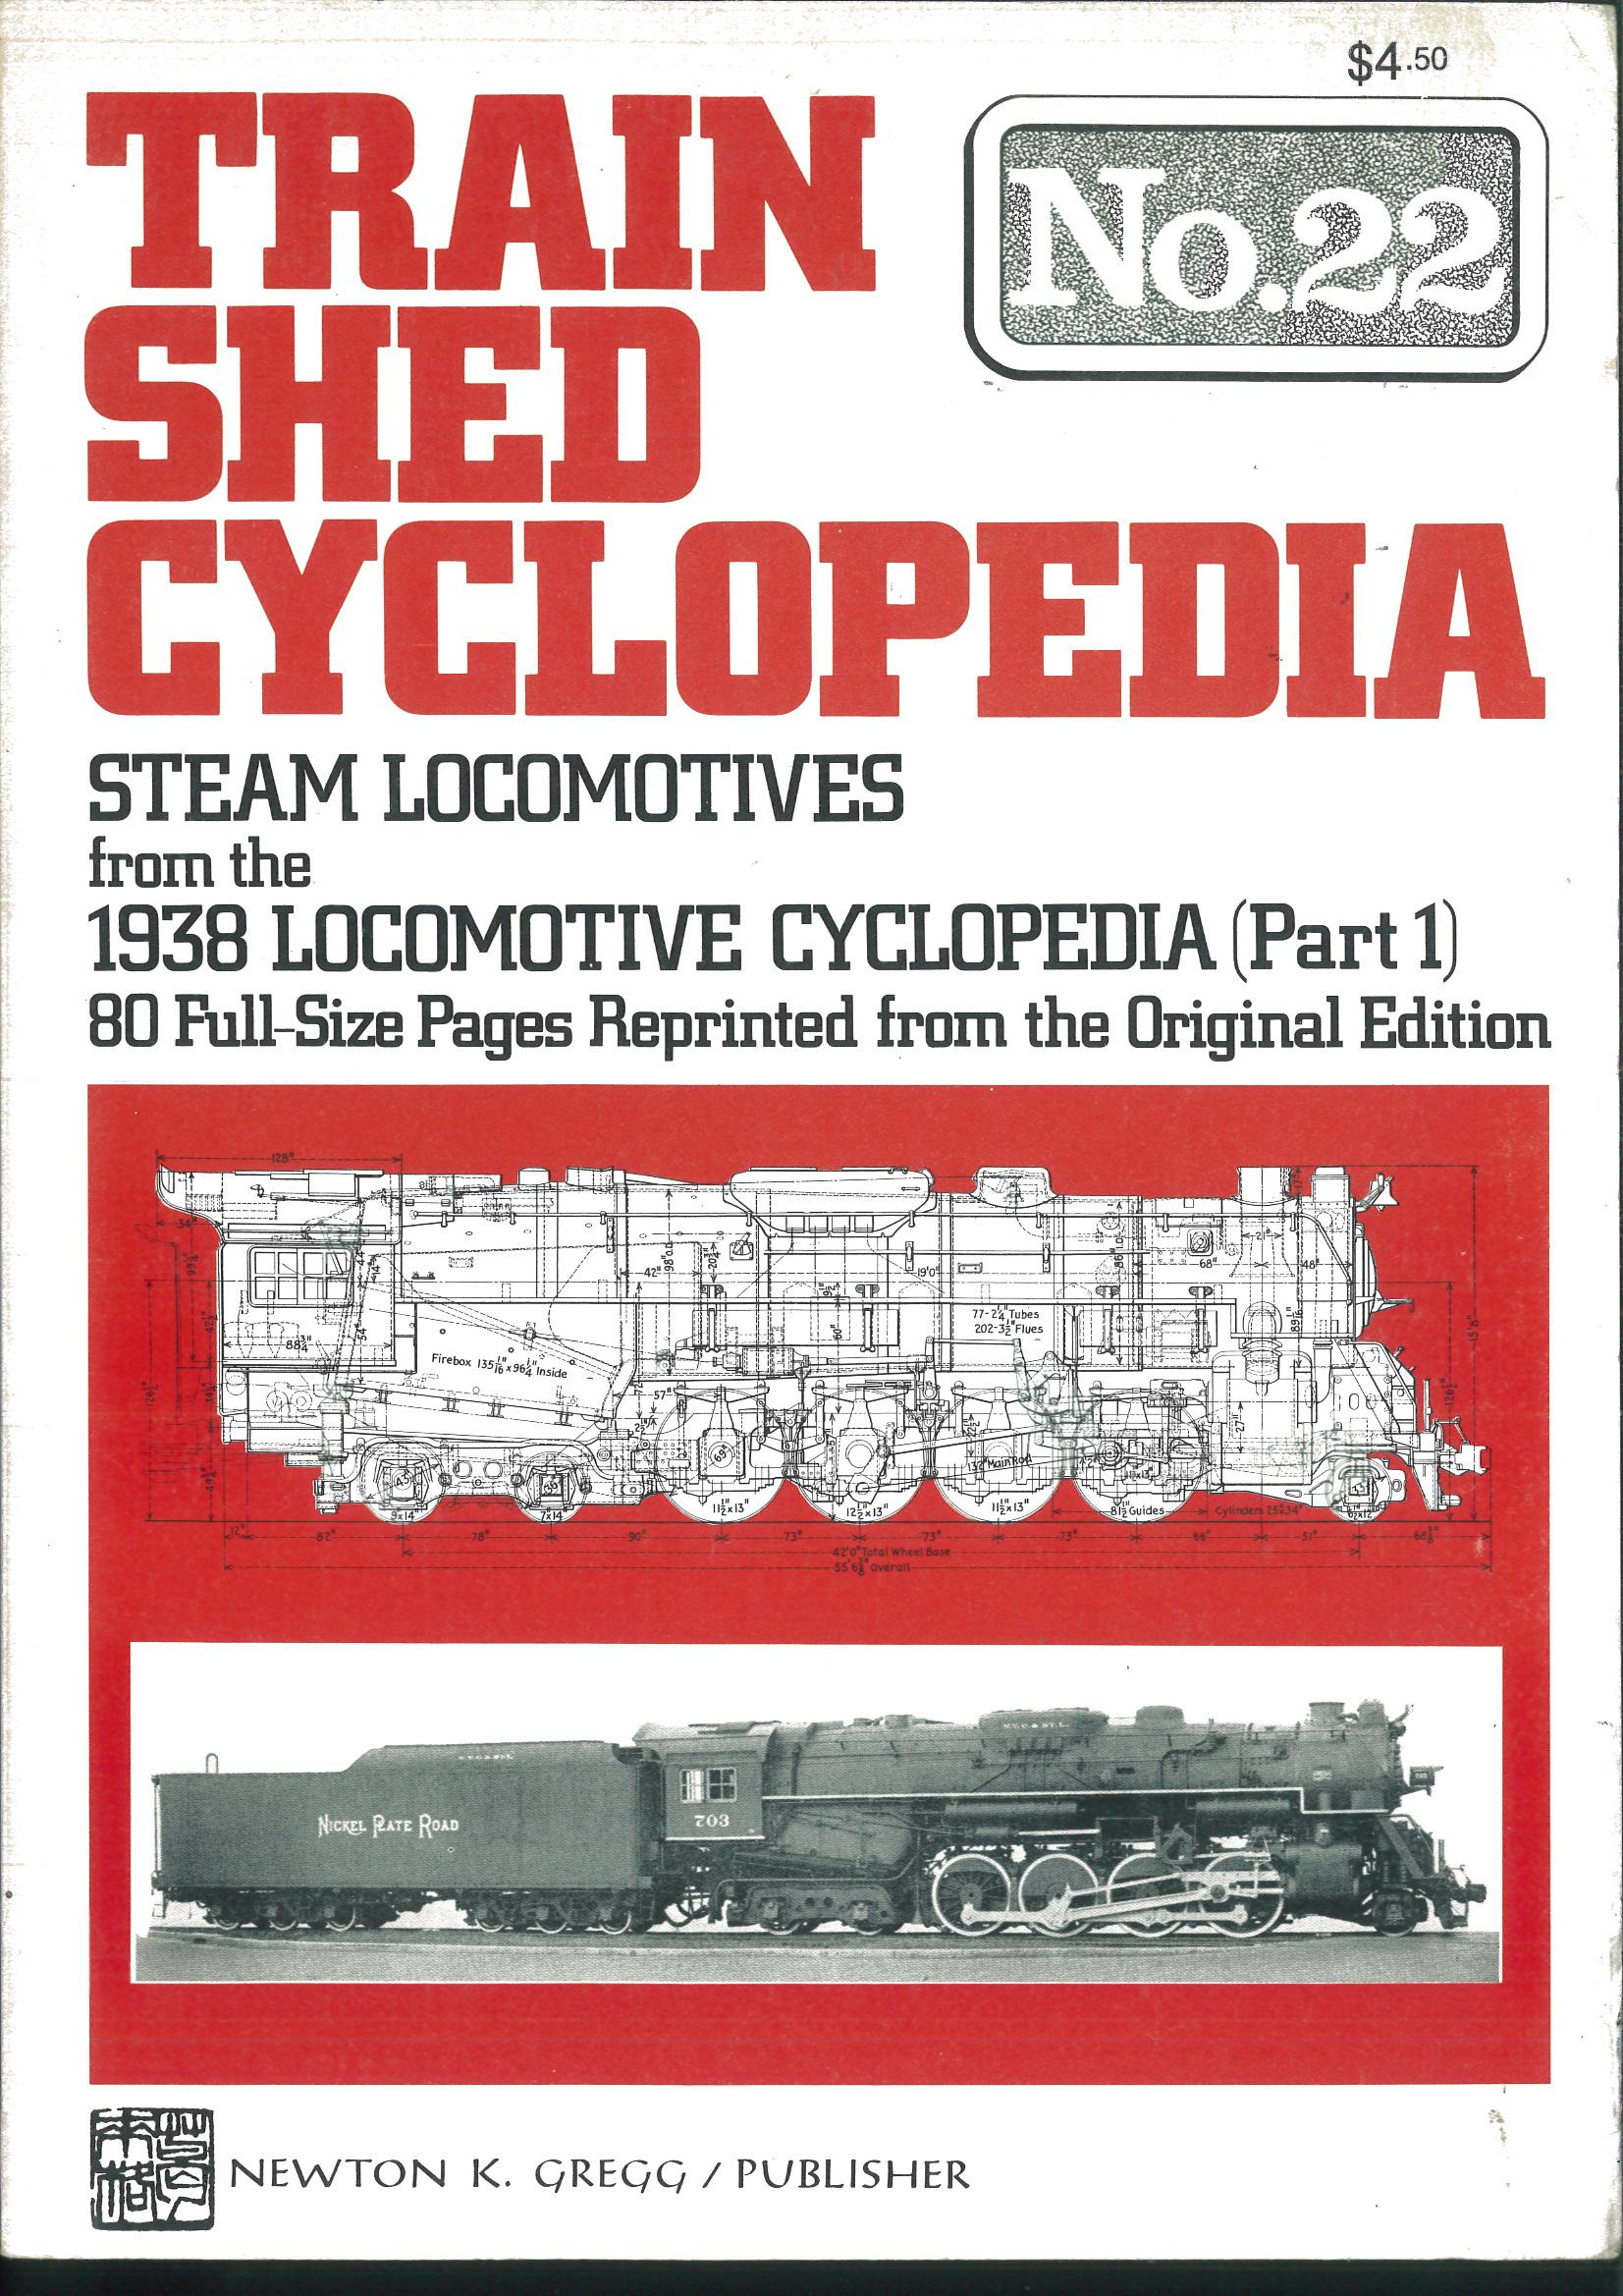 Train Shed Cyclopedia No. 22 - Steam Locomotives from the 1938 Locomotive Cyclopedia (Part 1)  | günstig bestellen bei Modelleisenbahn Center  MCS Vertriebs GmbH